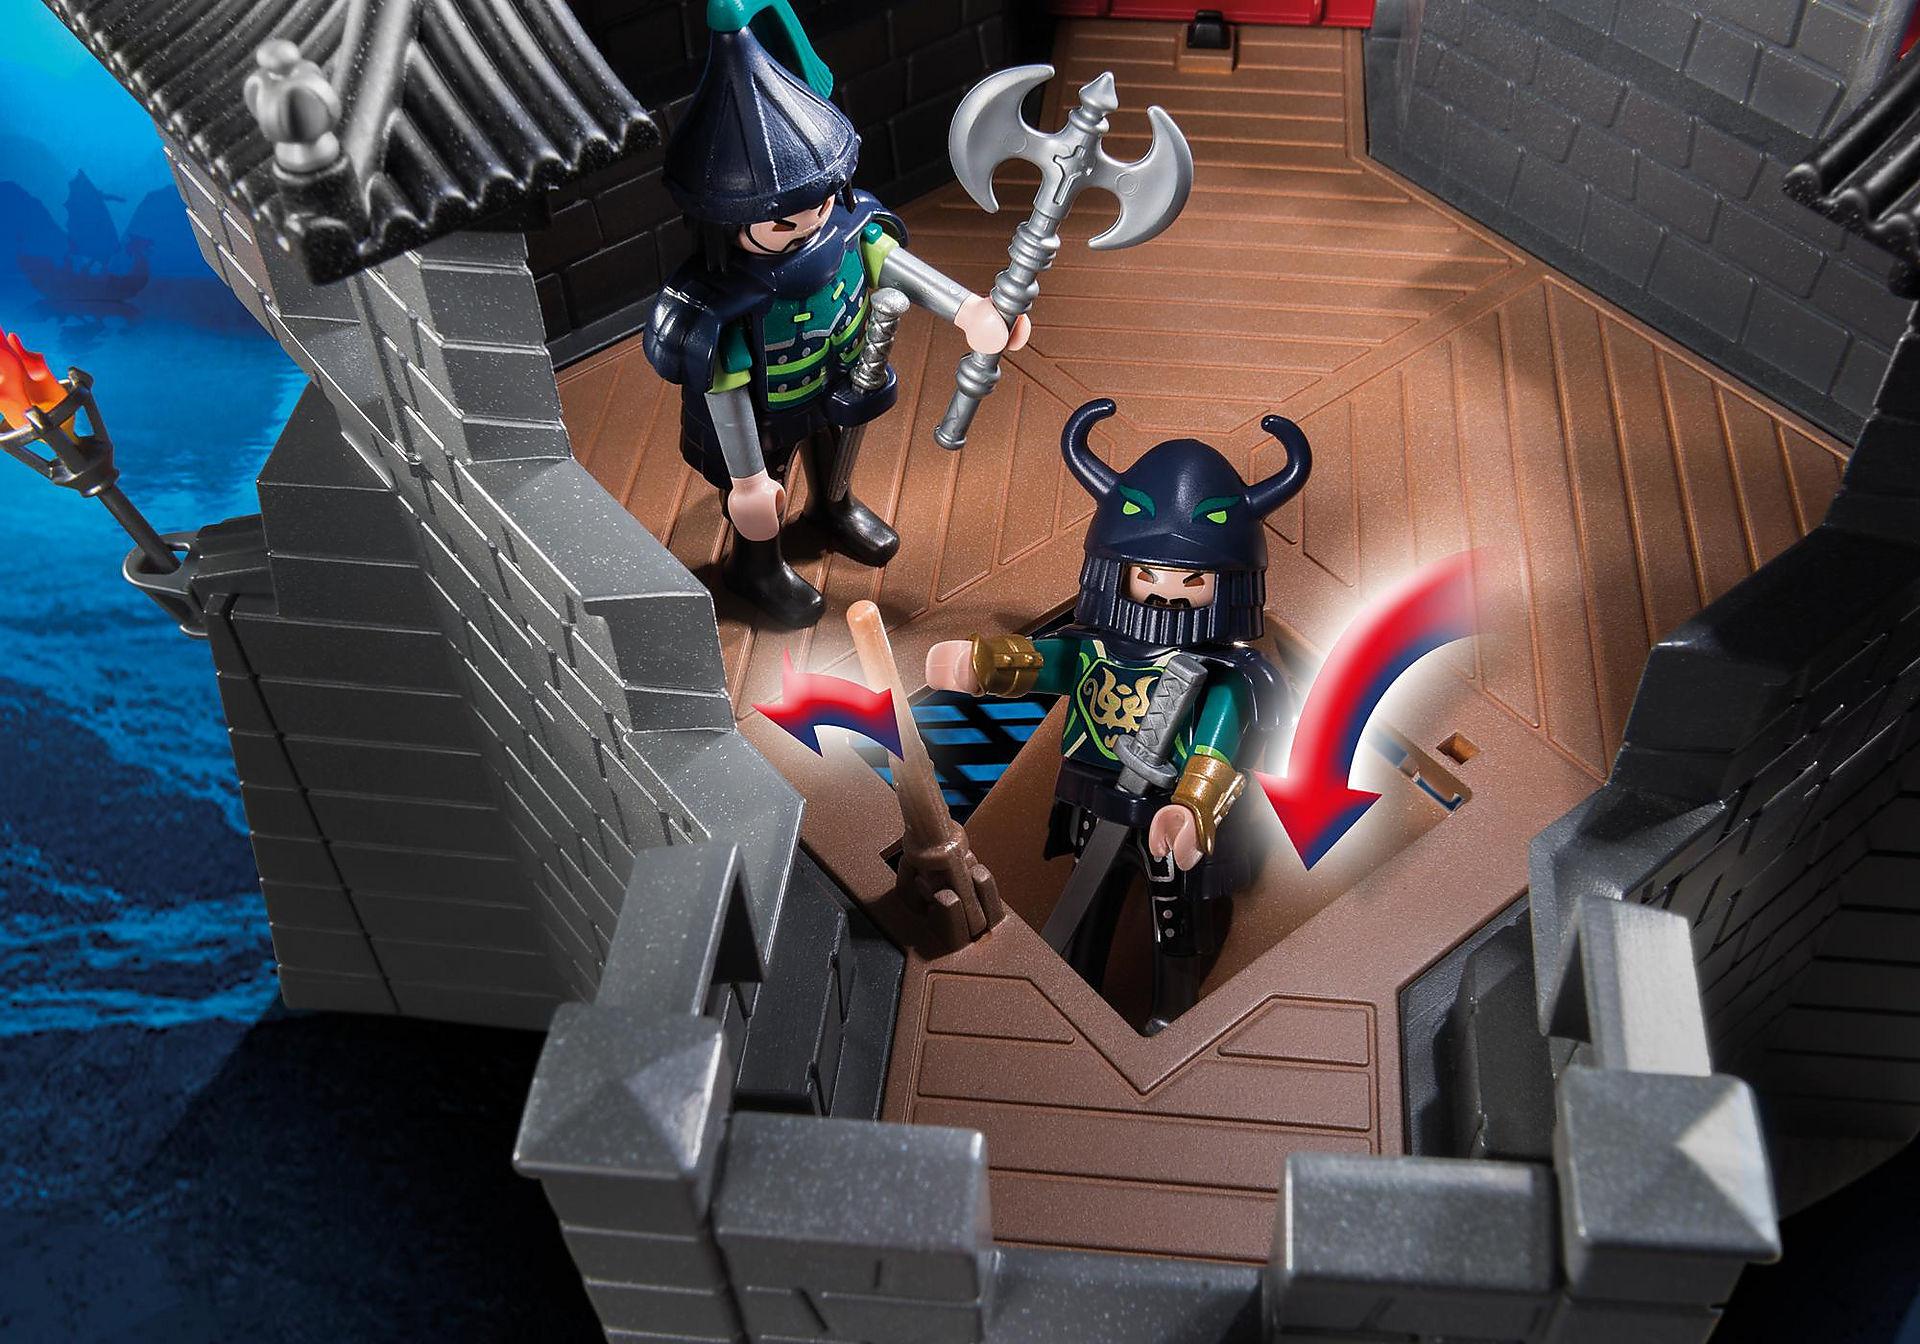 http://media.playmobil.com/i/playmobil/5480_product_extra2/Forte segreto del Drago